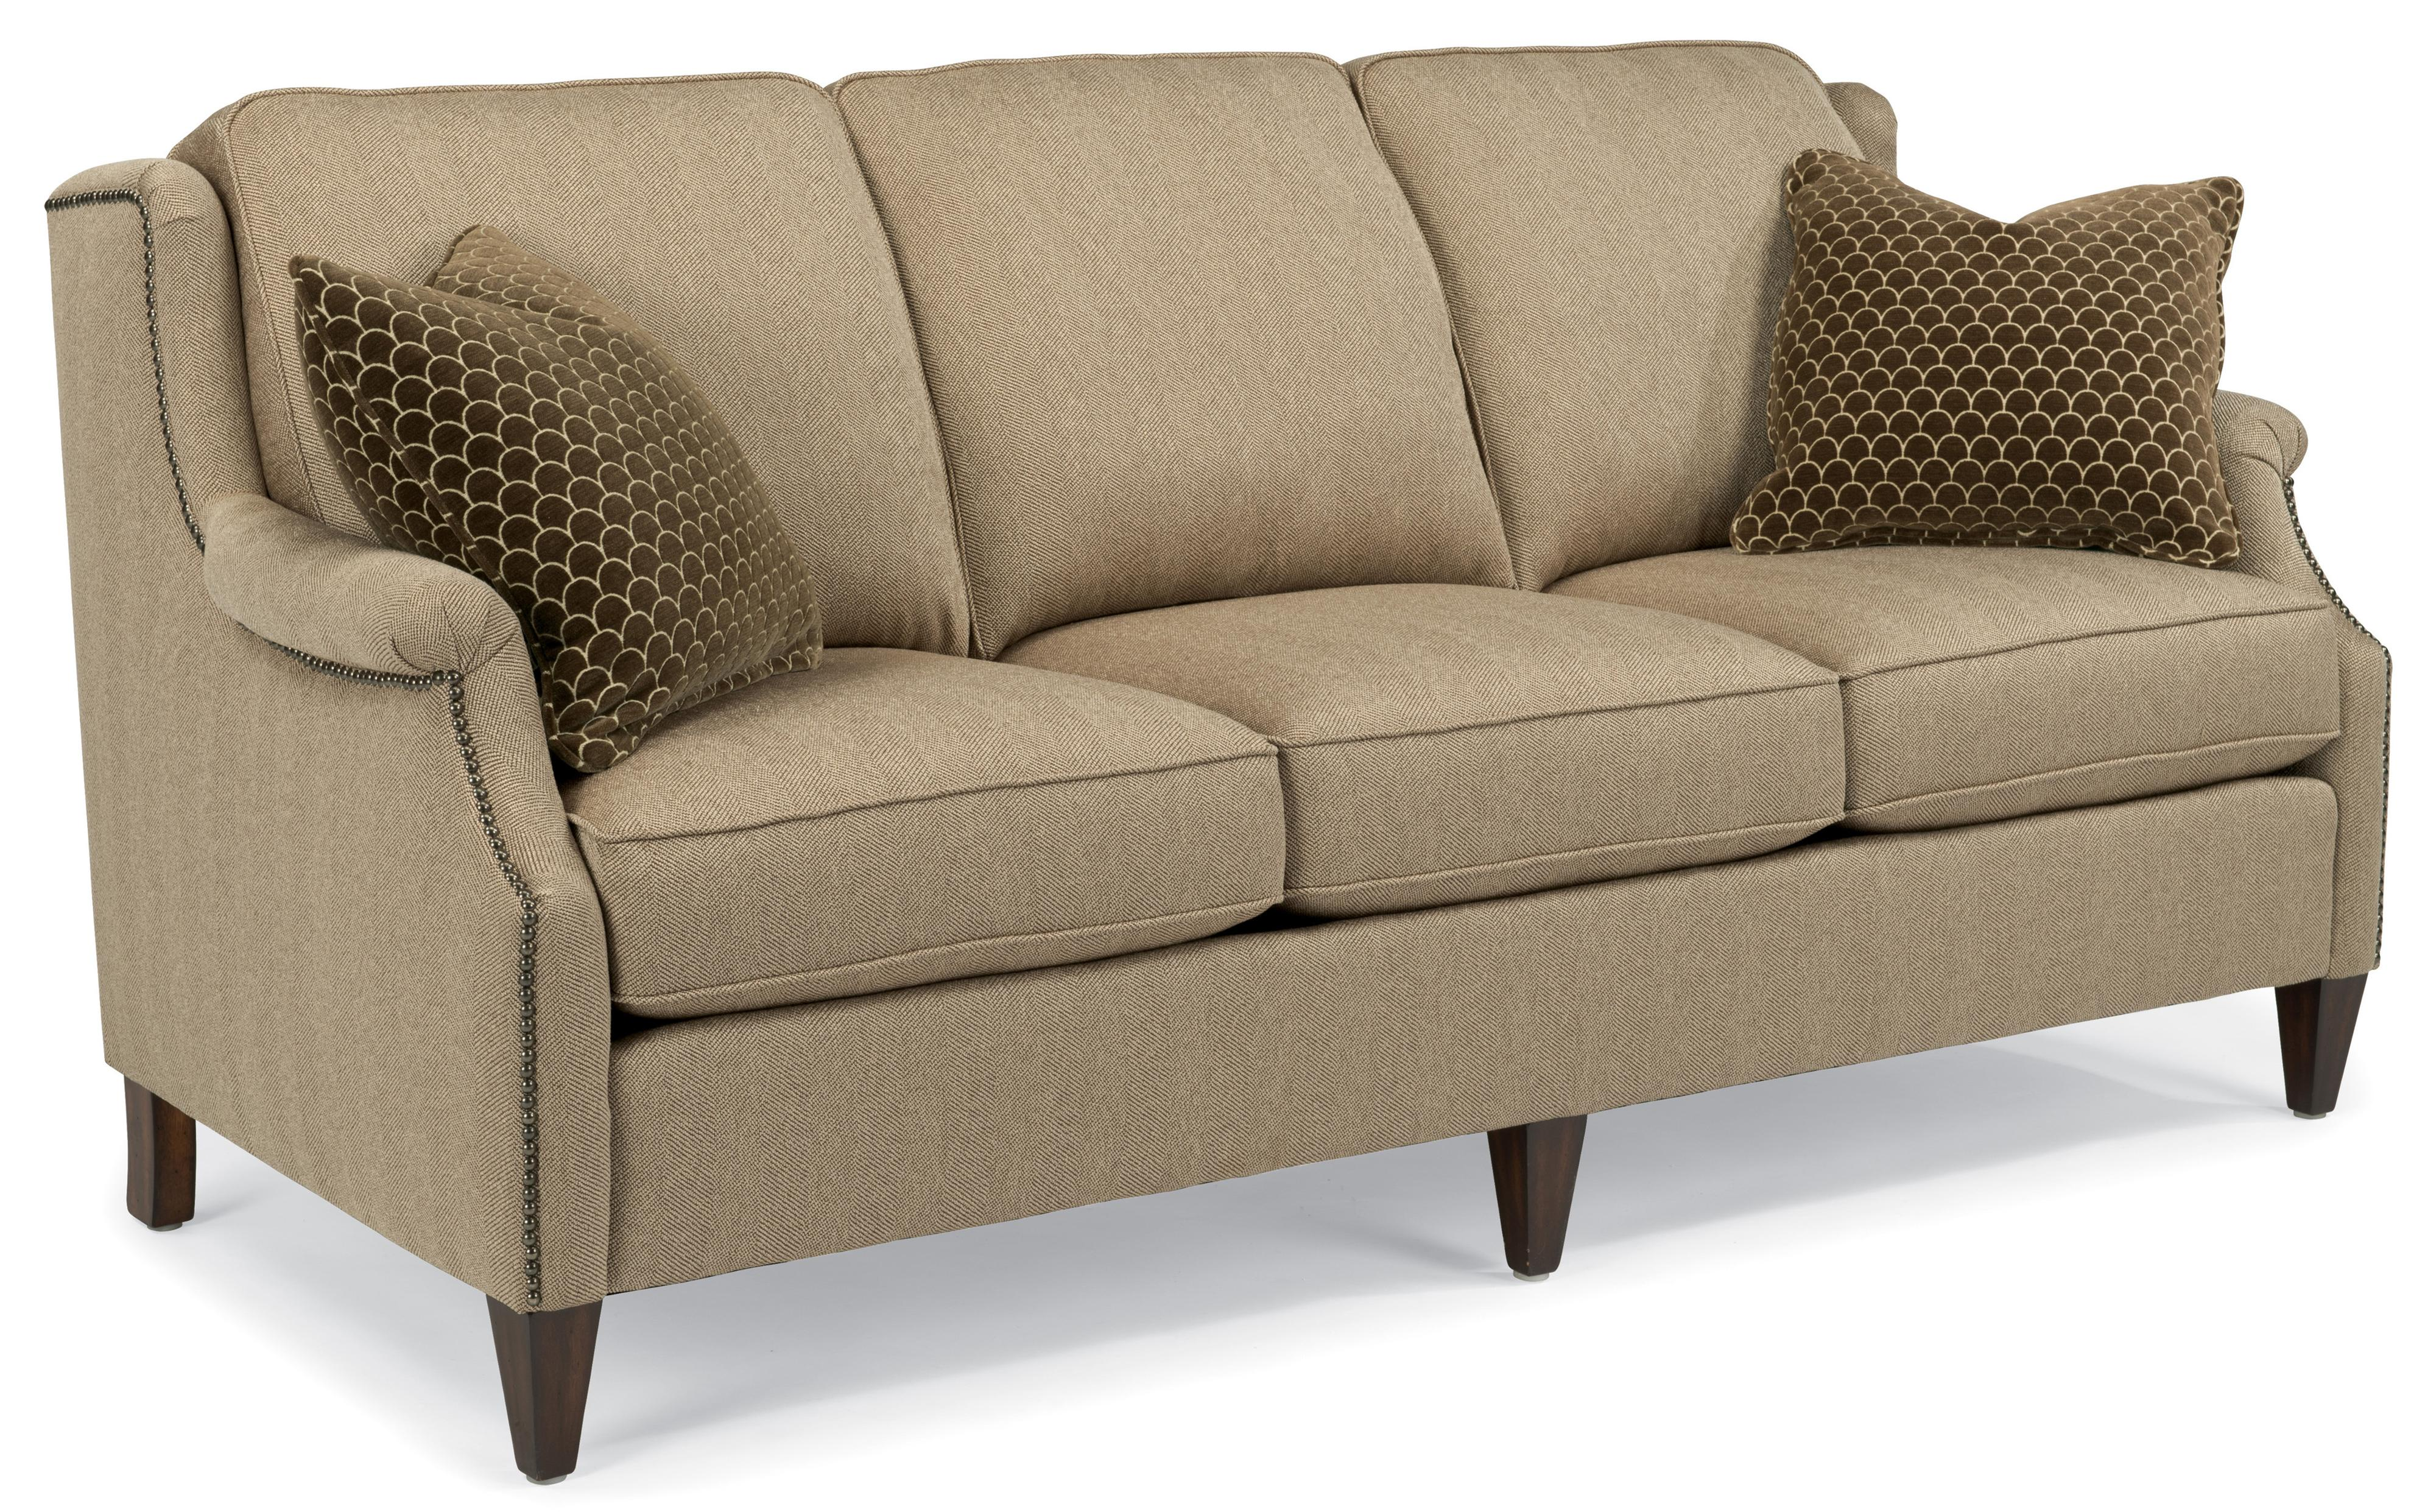 Flexsteel Zevon Transitional Sofa With Slender English